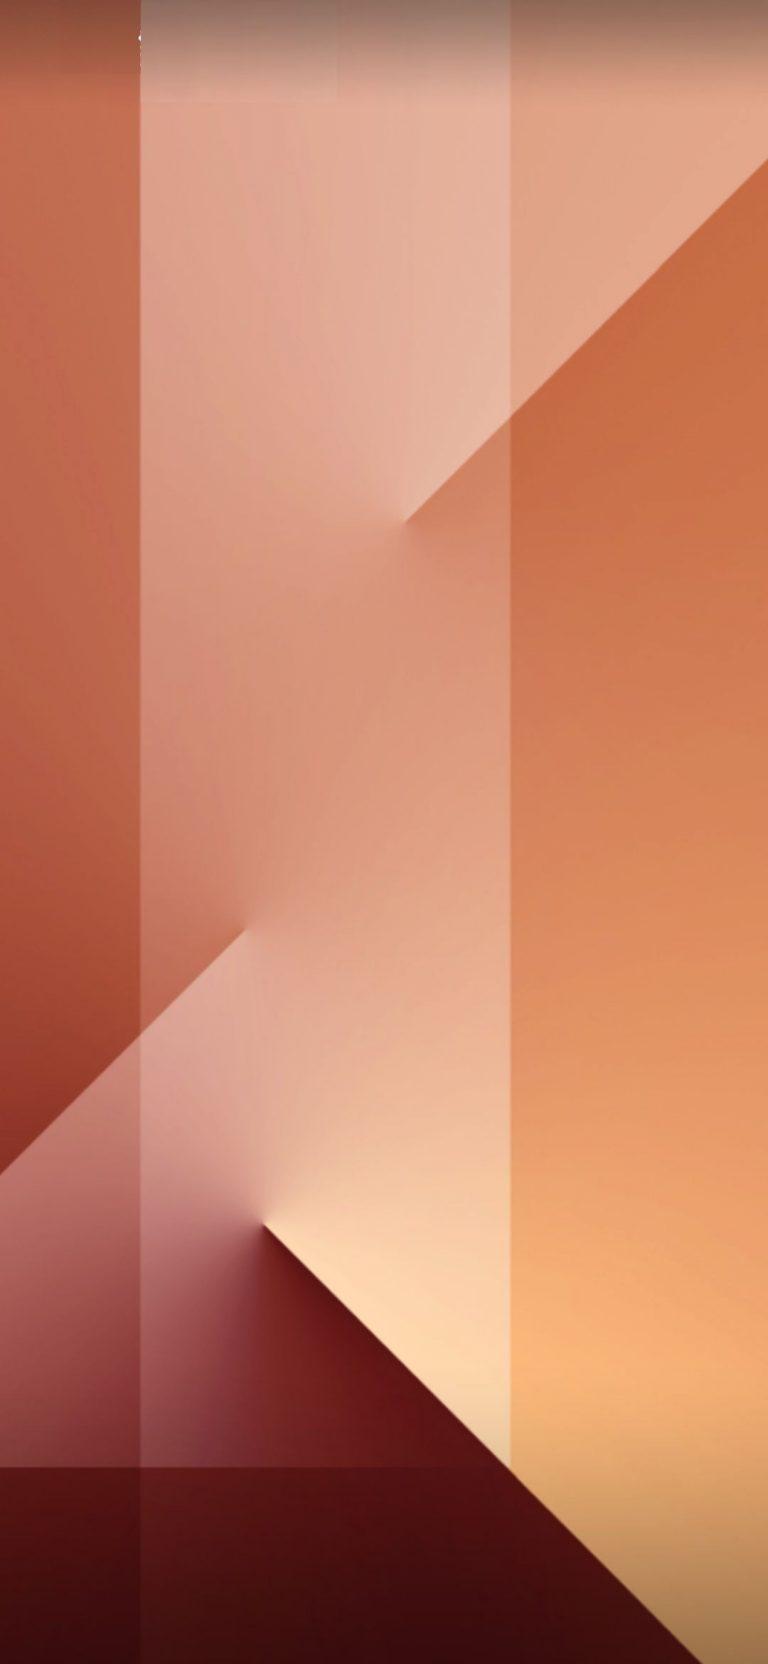 Honor X10 Stock Wallpaper [1080x2340] - 02